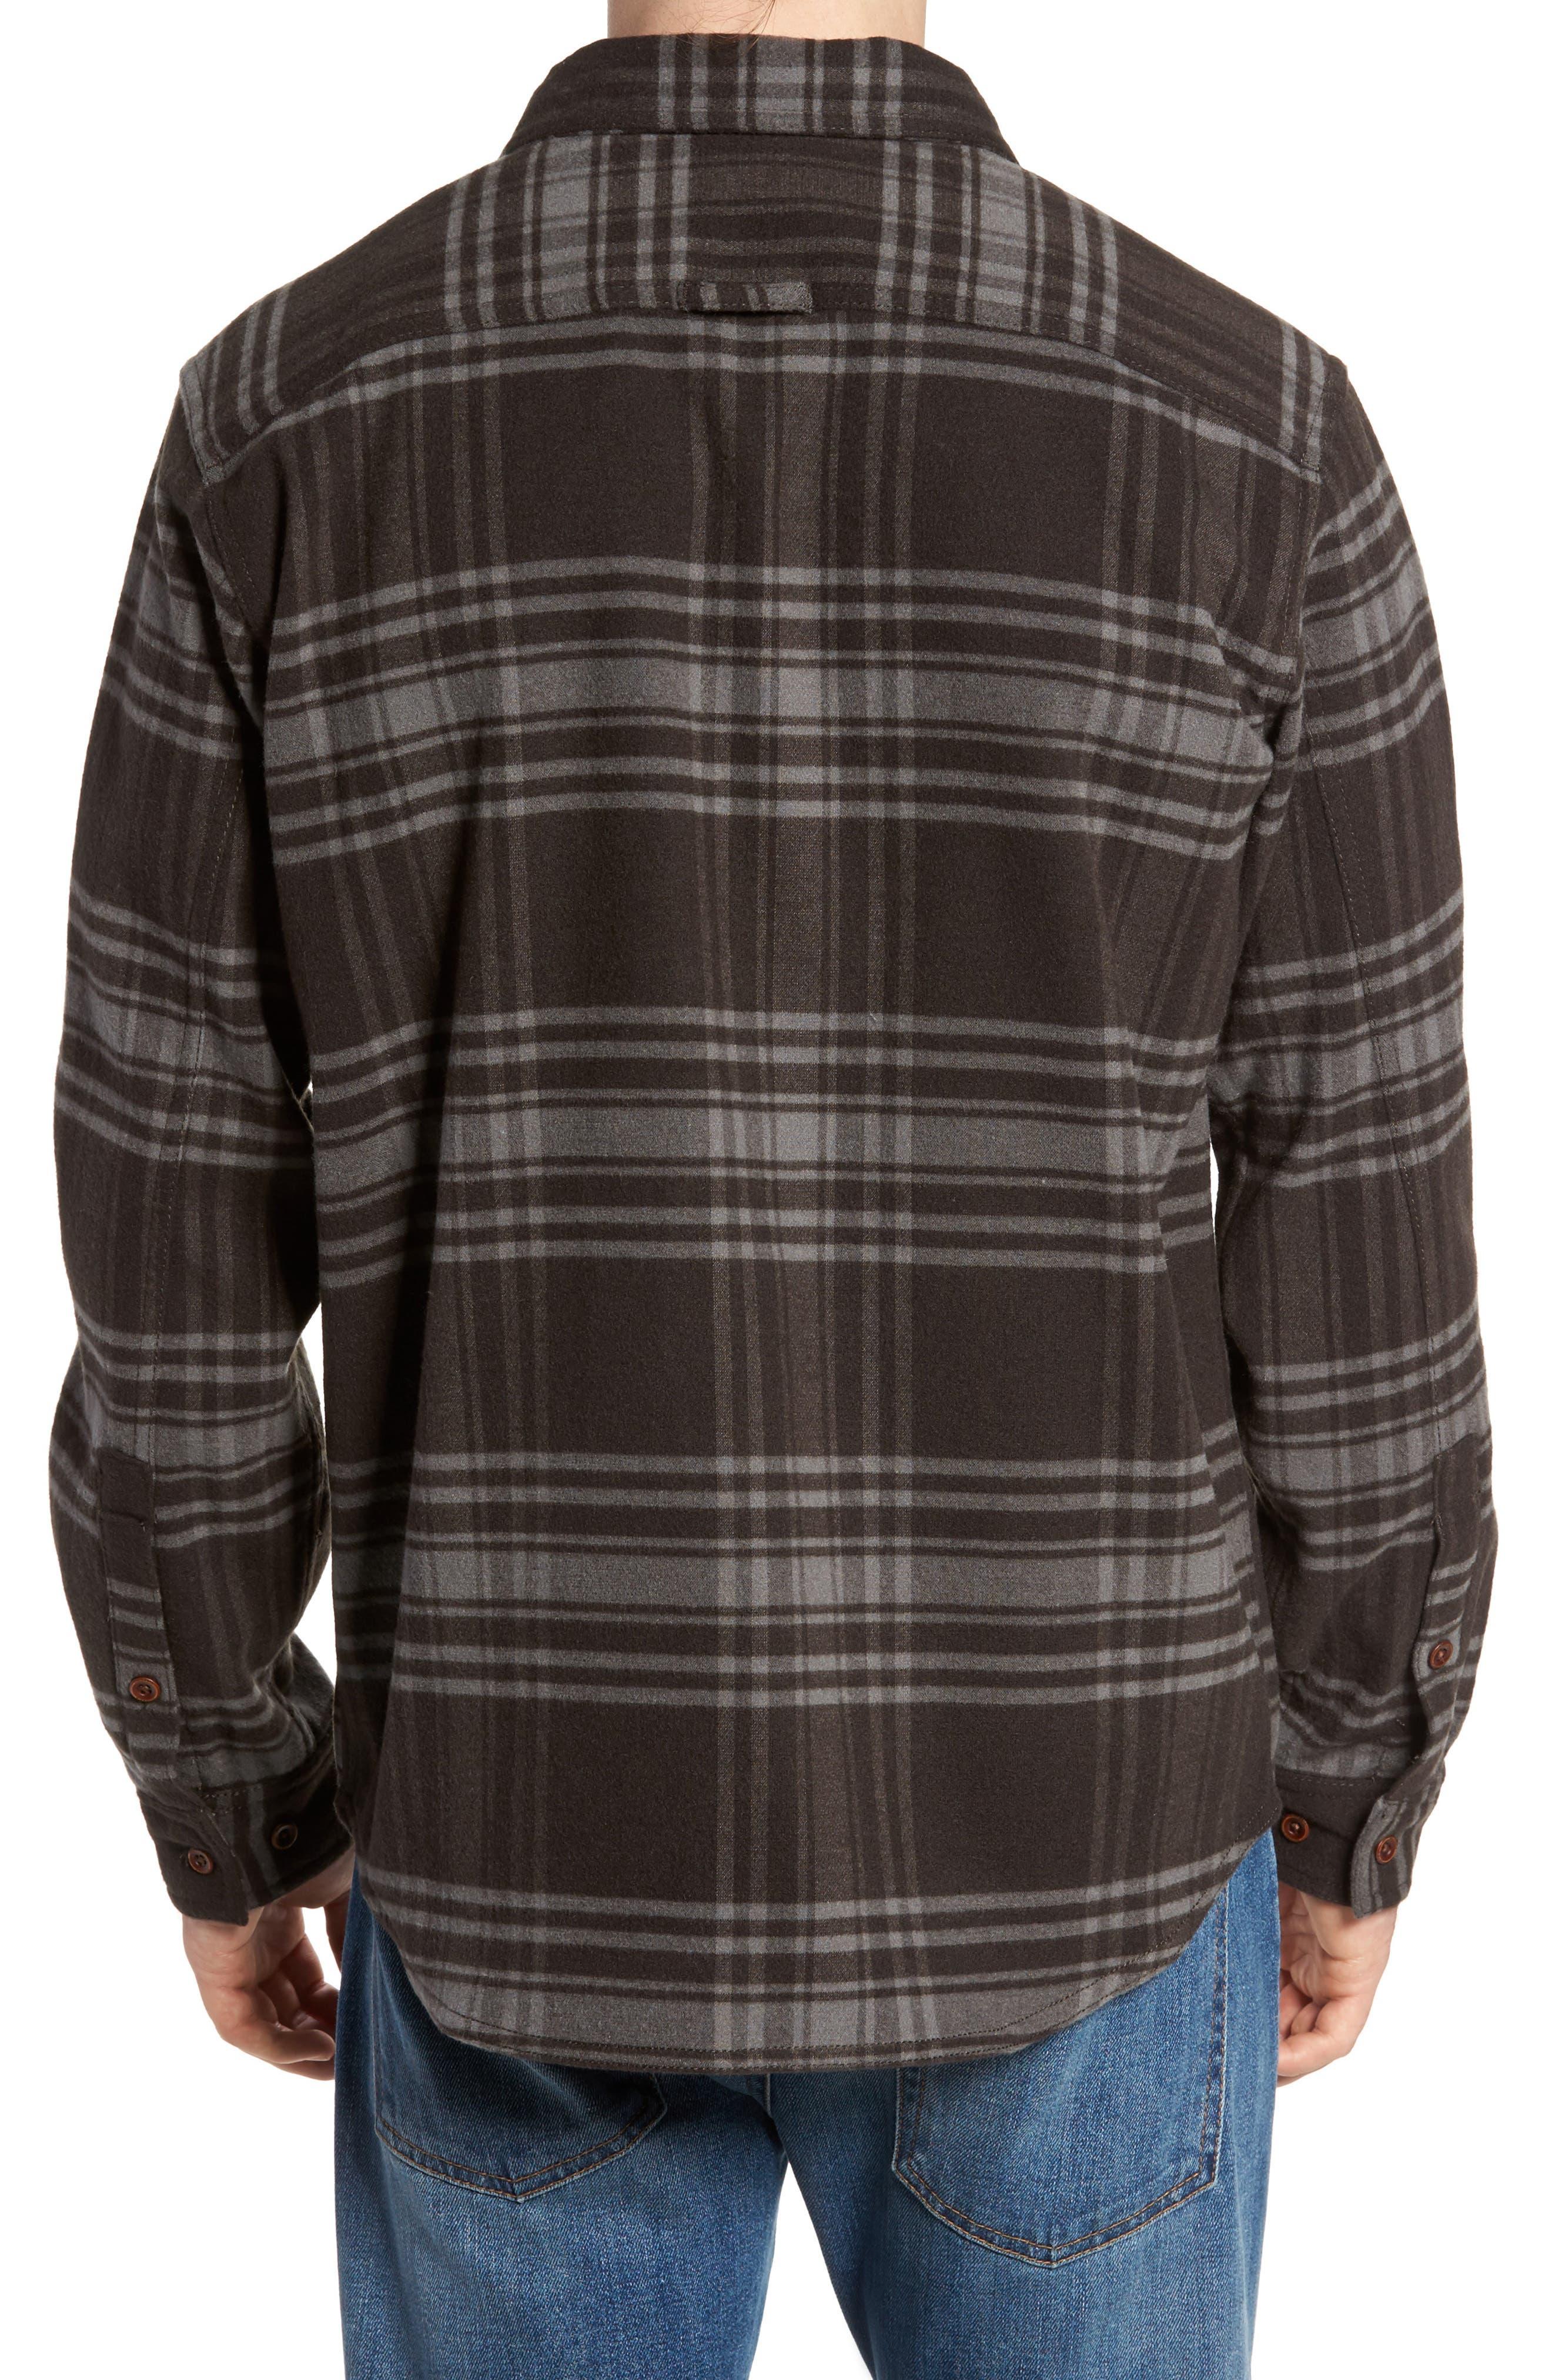 Deschutes River<sup>™</sup> Heavyweight Flannel Shirt Jacket,                             Alternate thumbnail 2, color,                             200